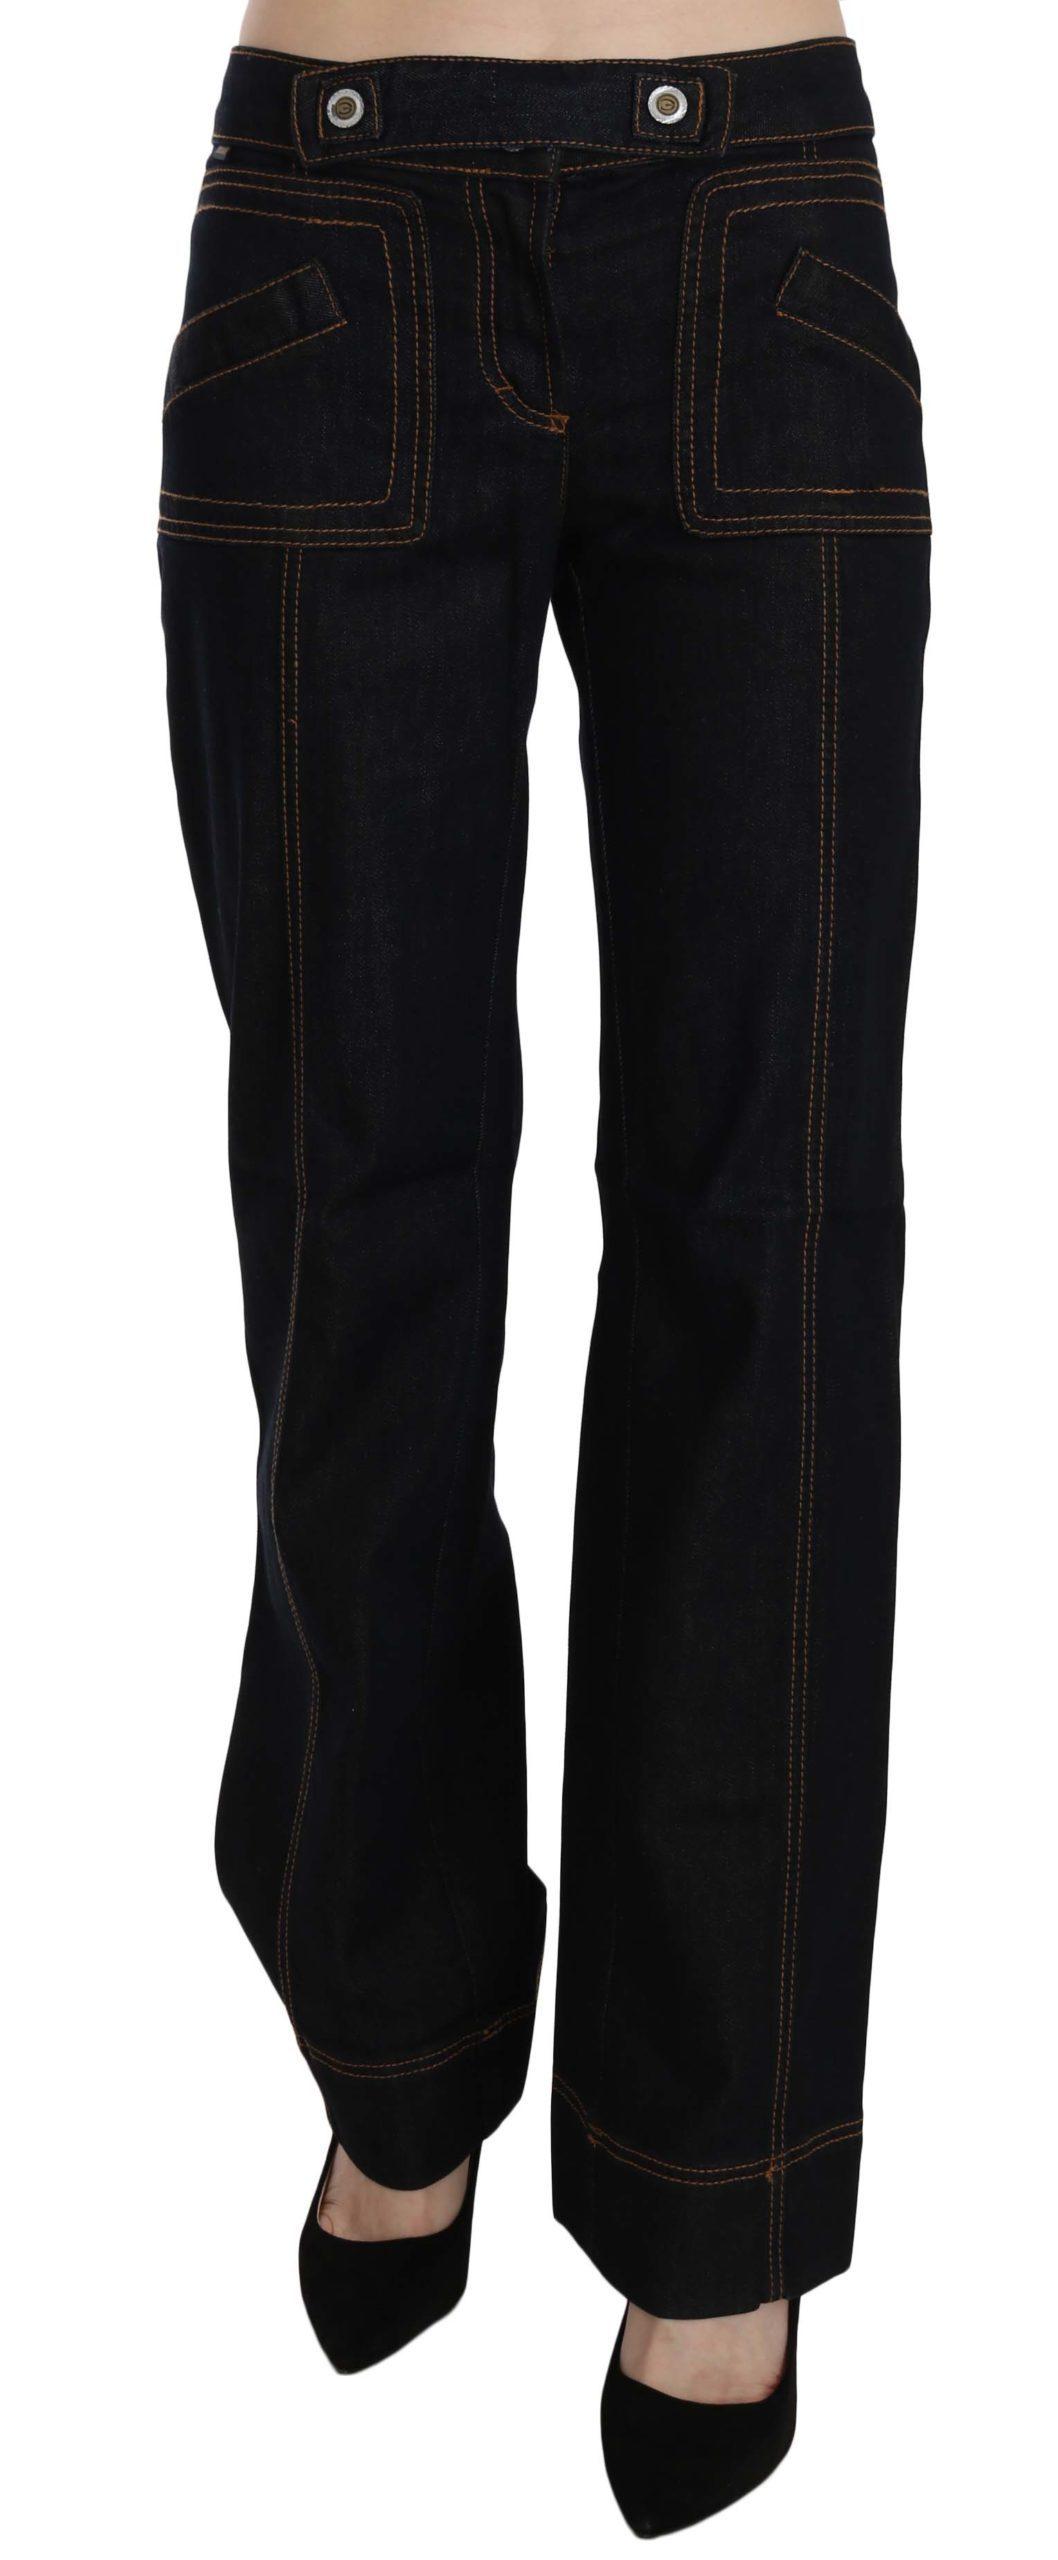 Just Cavalli Women's Mid Waist Straight Denim Trouser Black PAN70369 - W24